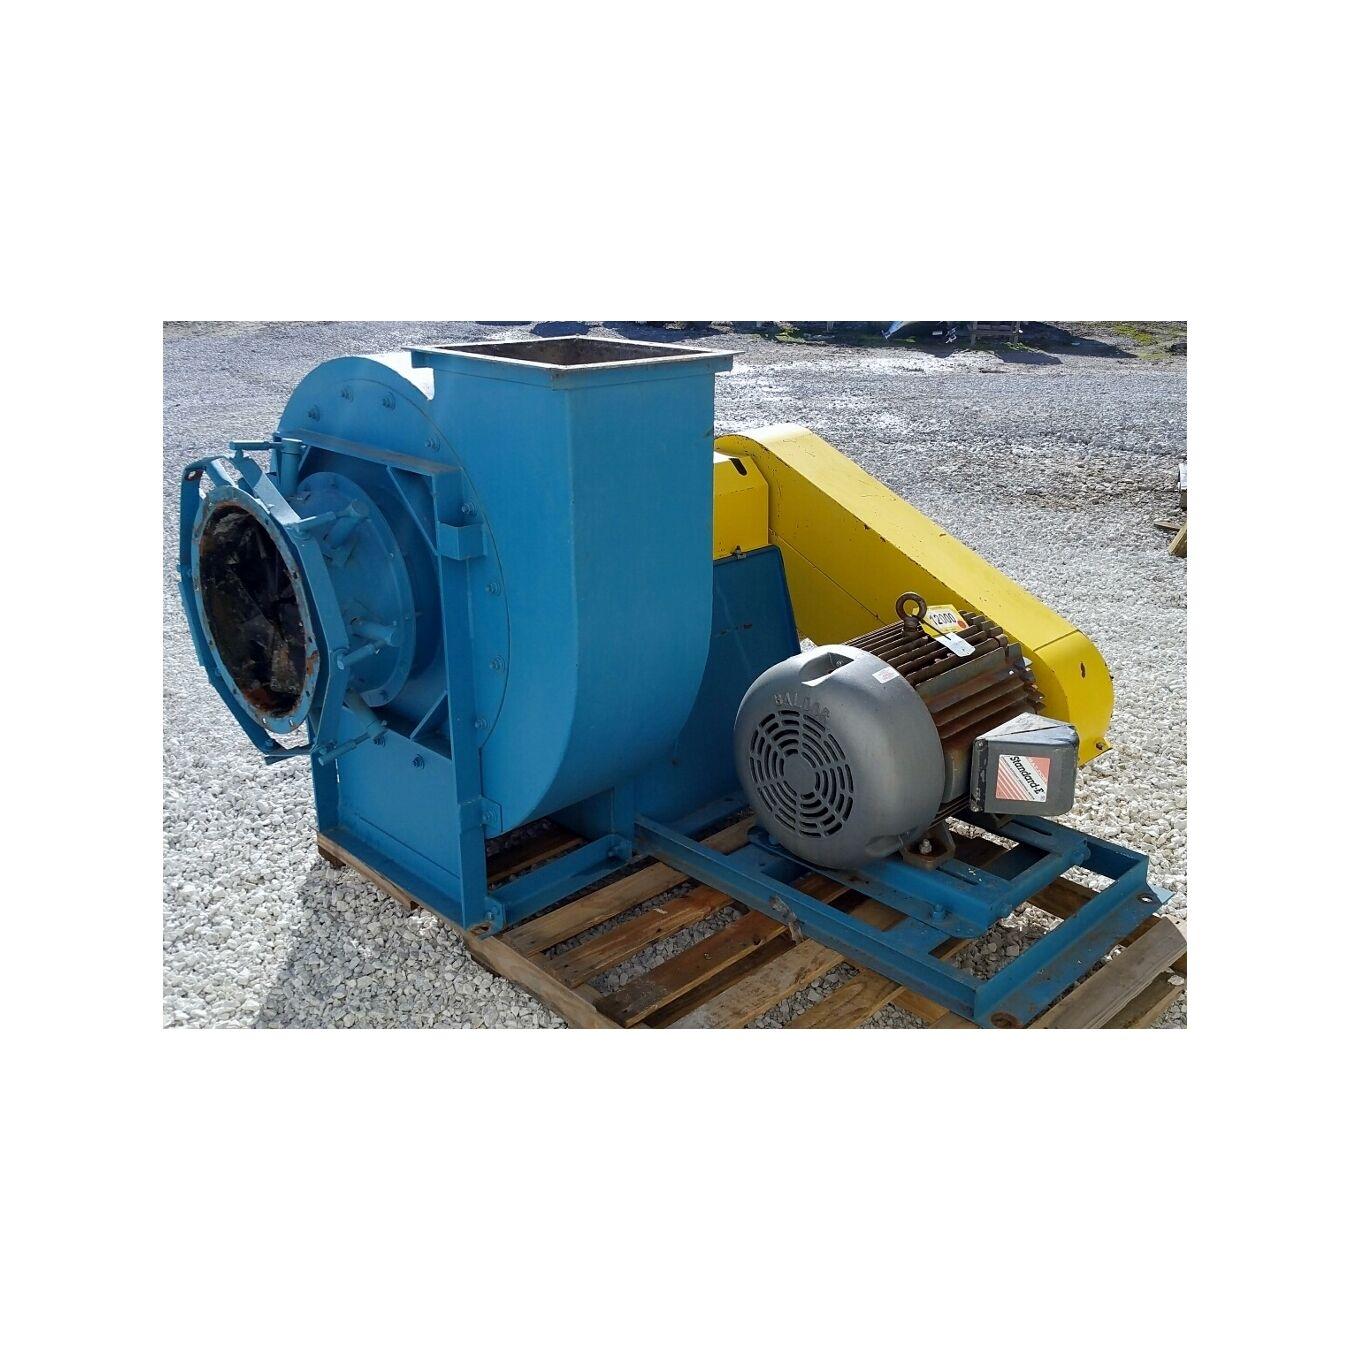 Pressure Vs Cfm Fan : Cfm quot sp used twin city high pressure industrial